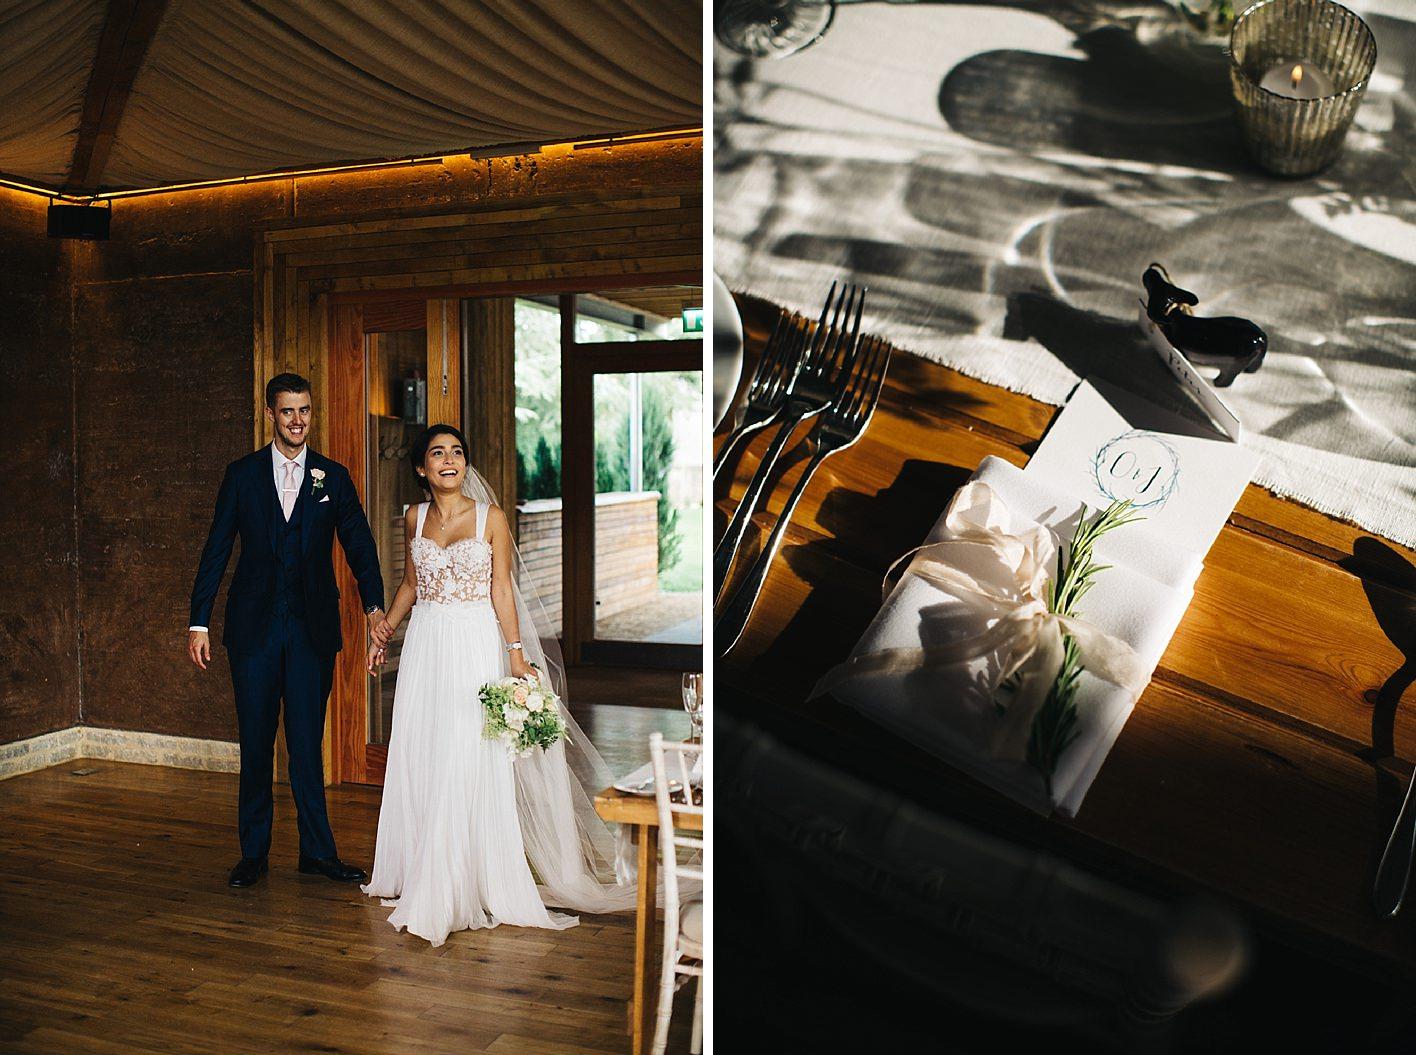 bride and groom look at reception room